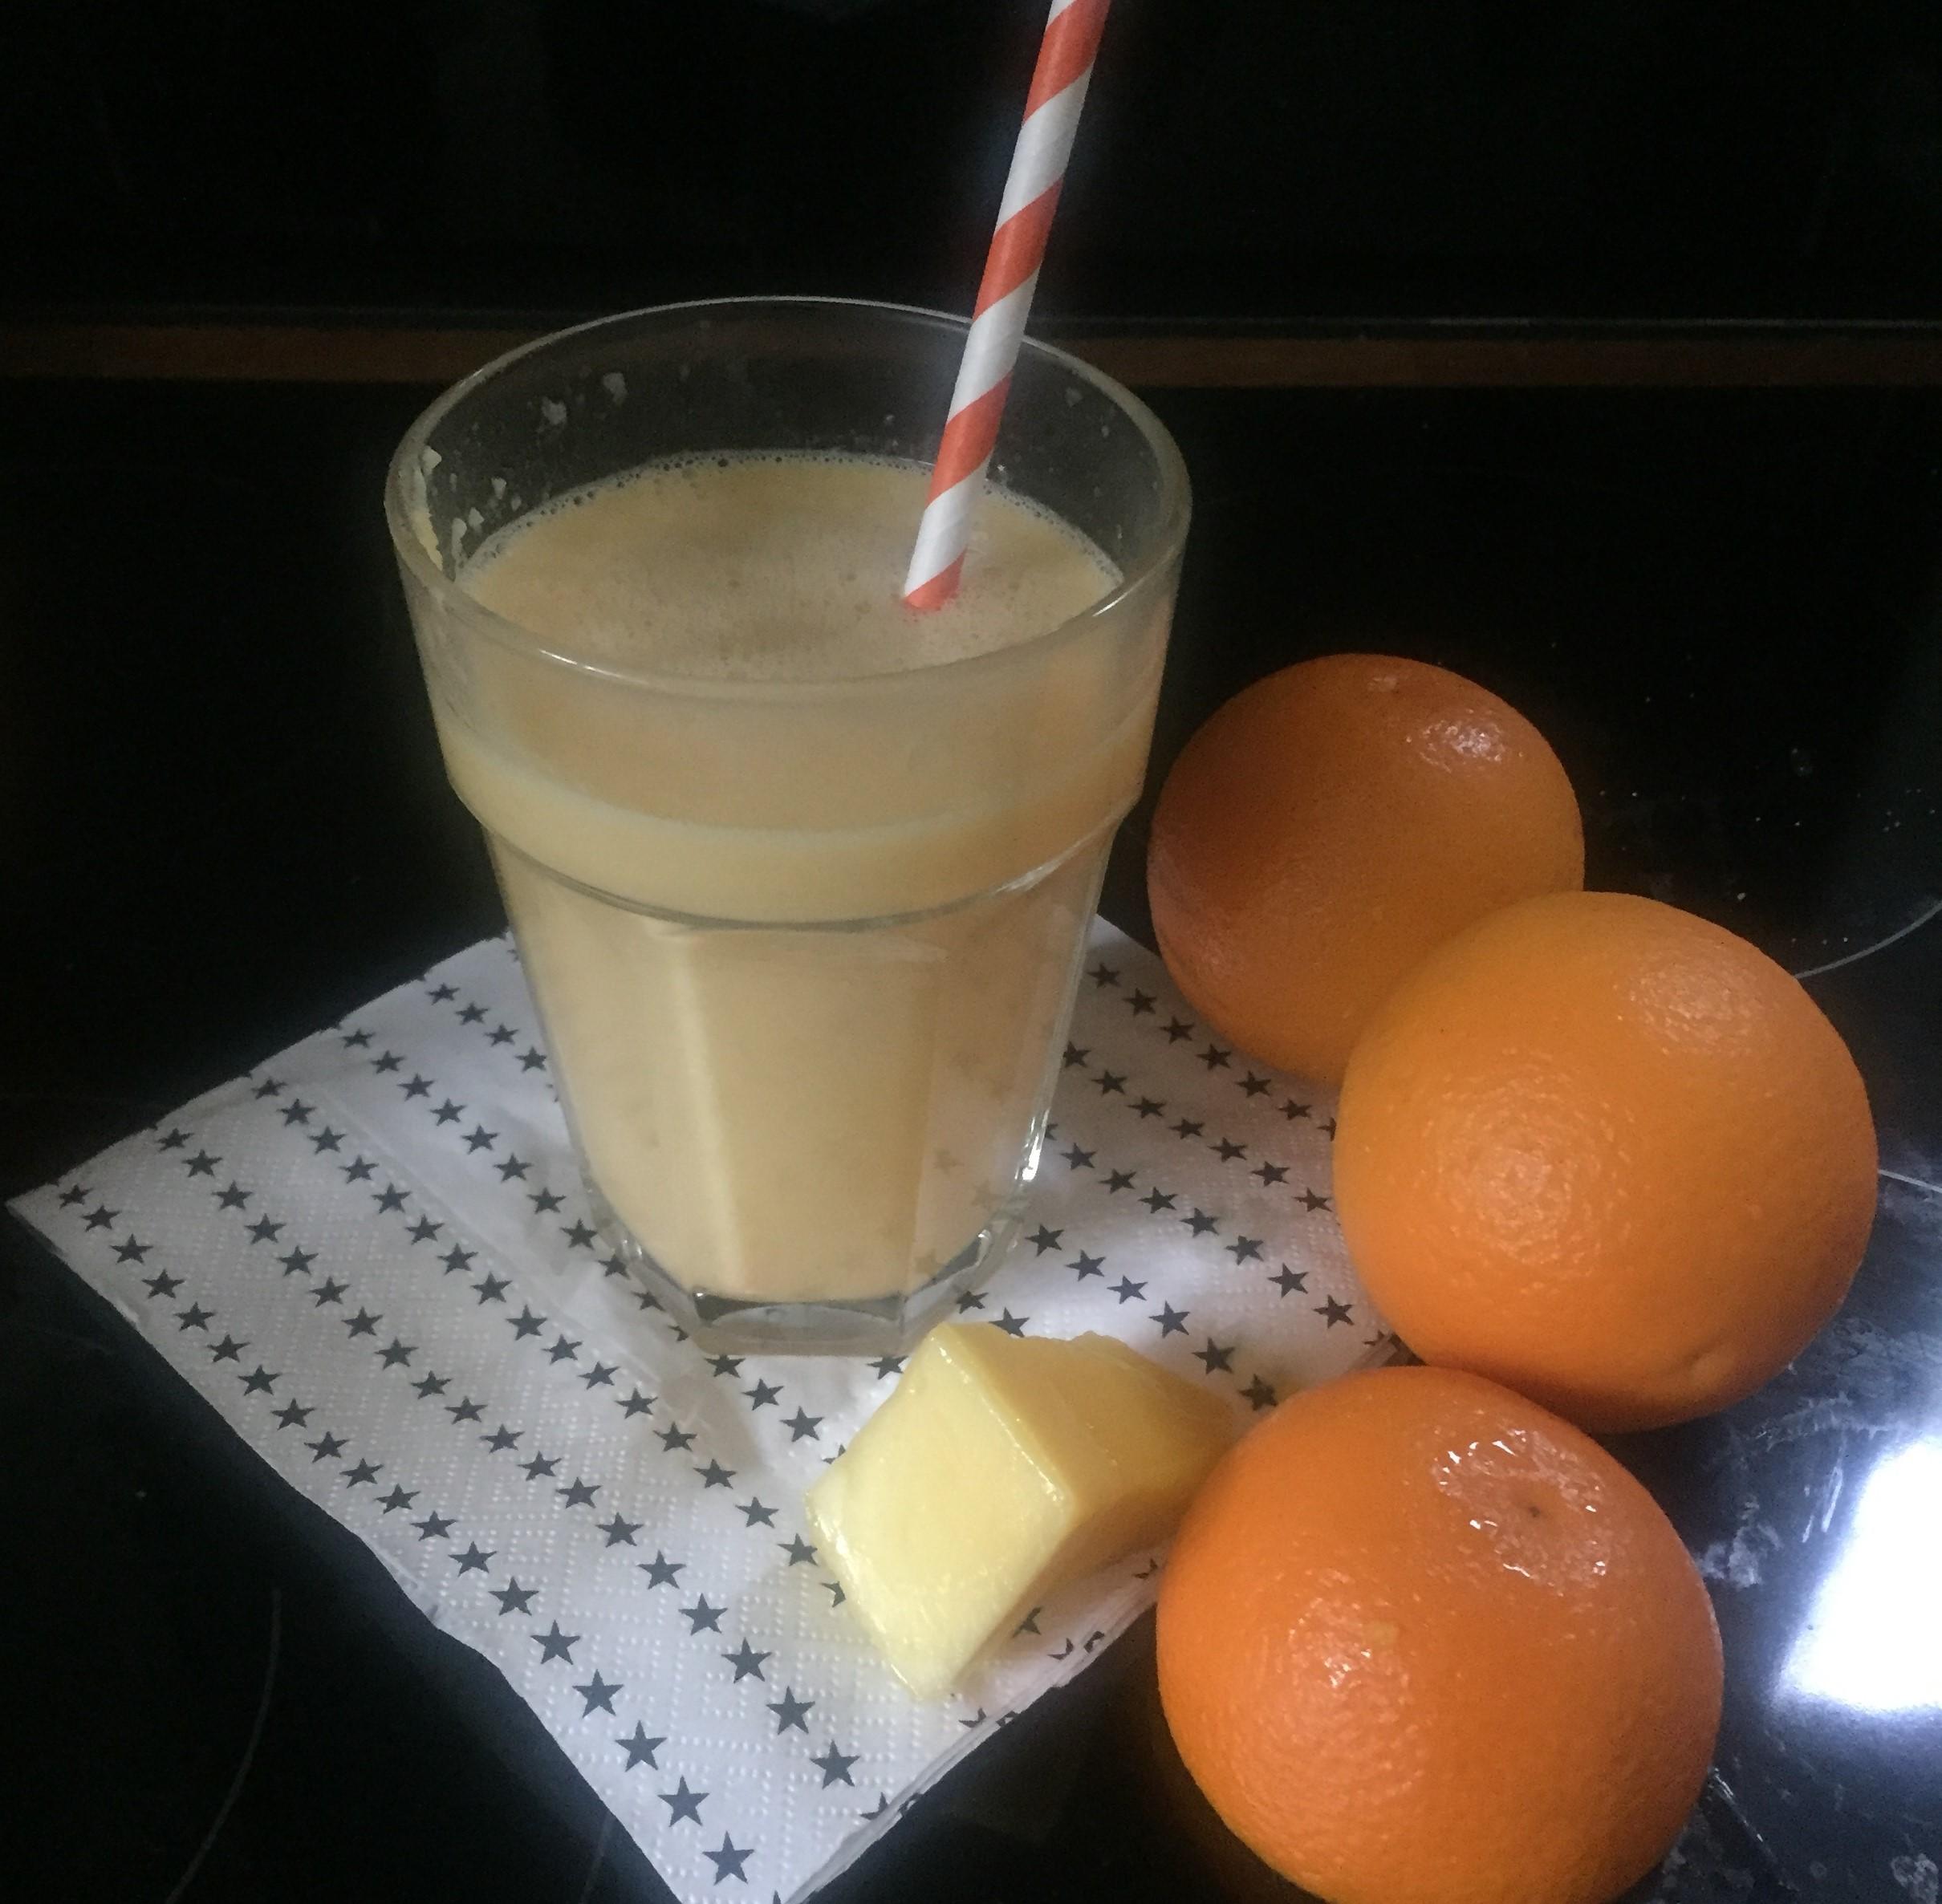 Orange and Mango smoothie with a straw